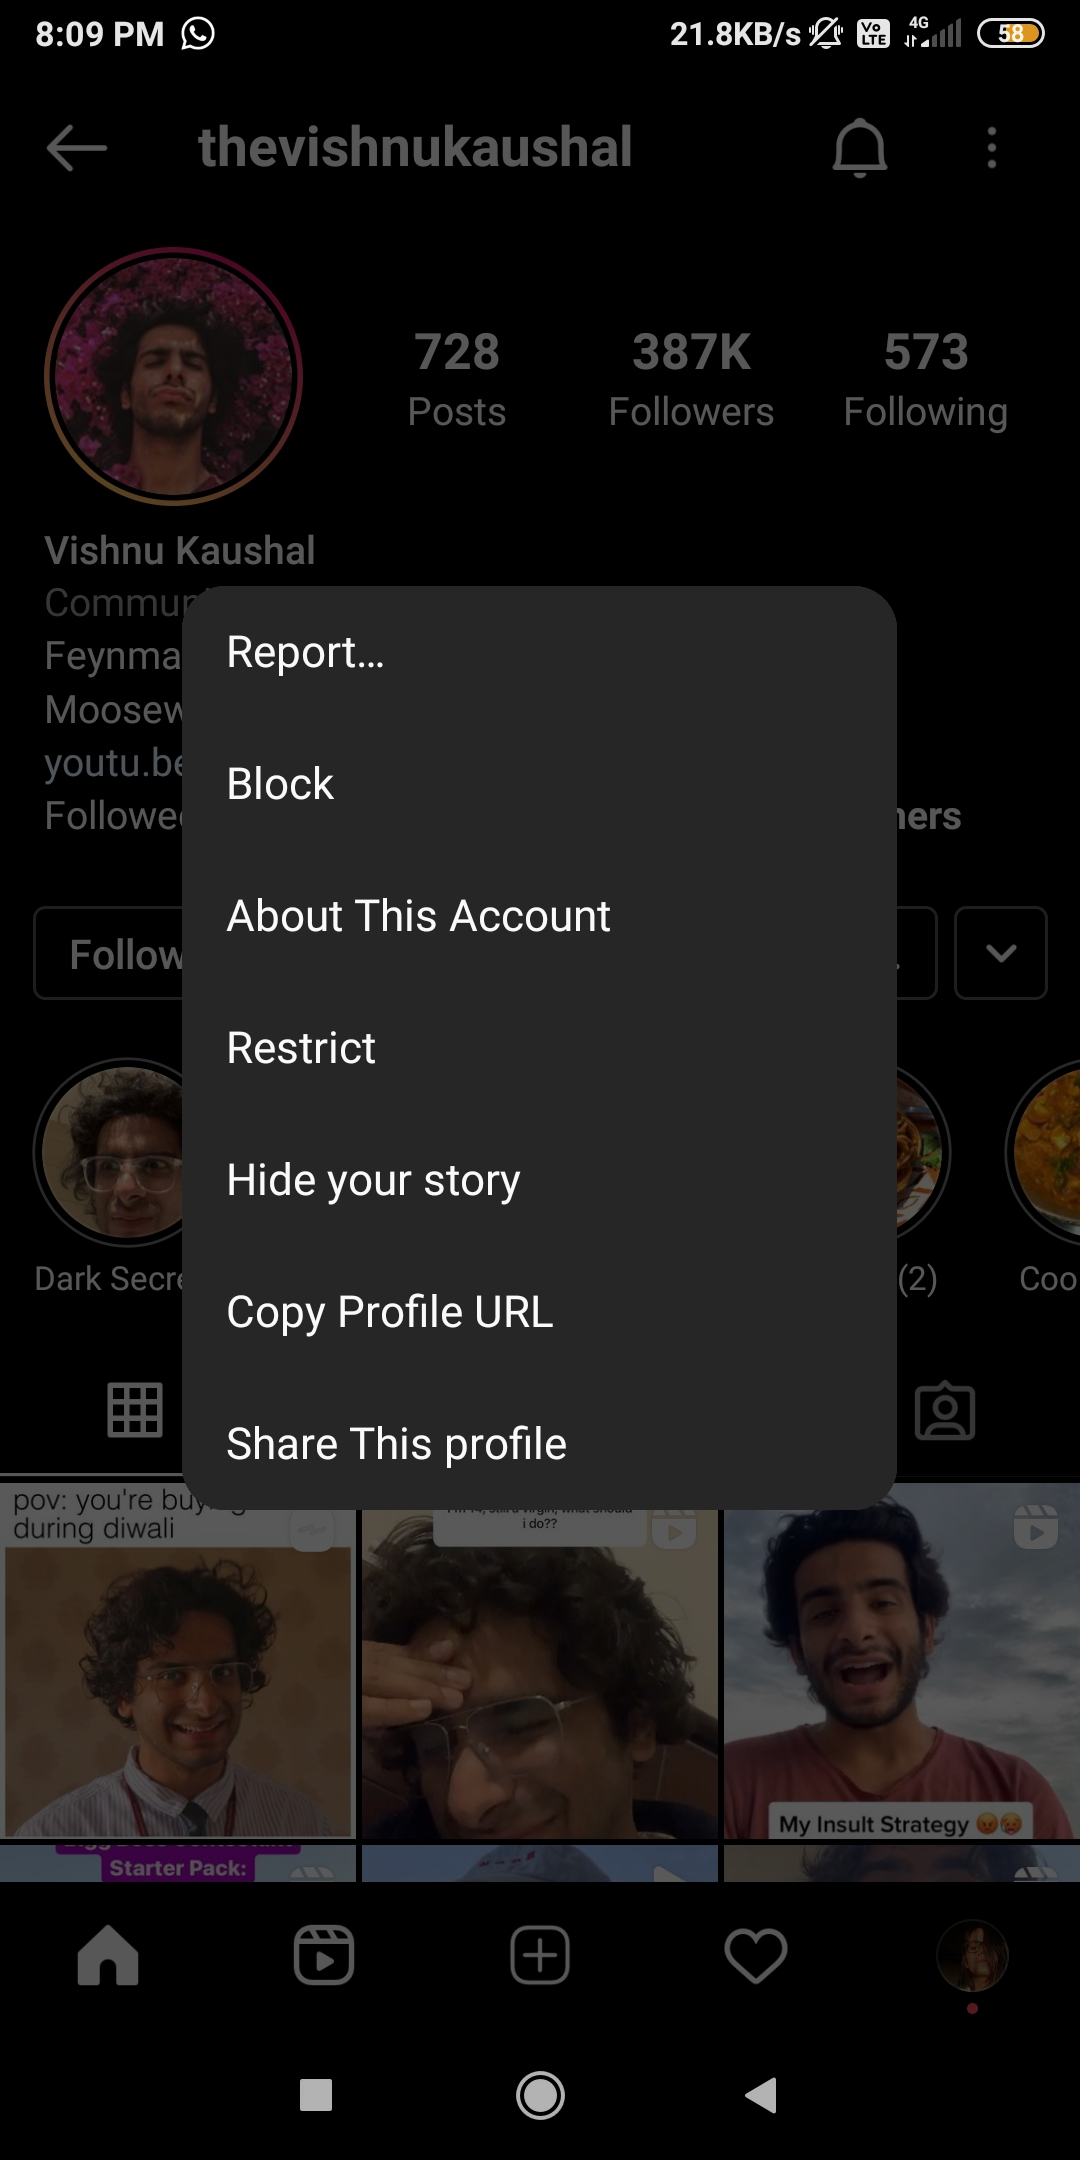 Restrict Account  - Restrict account - 34 Instagram HACKS & TRICKS to Explore in 2021